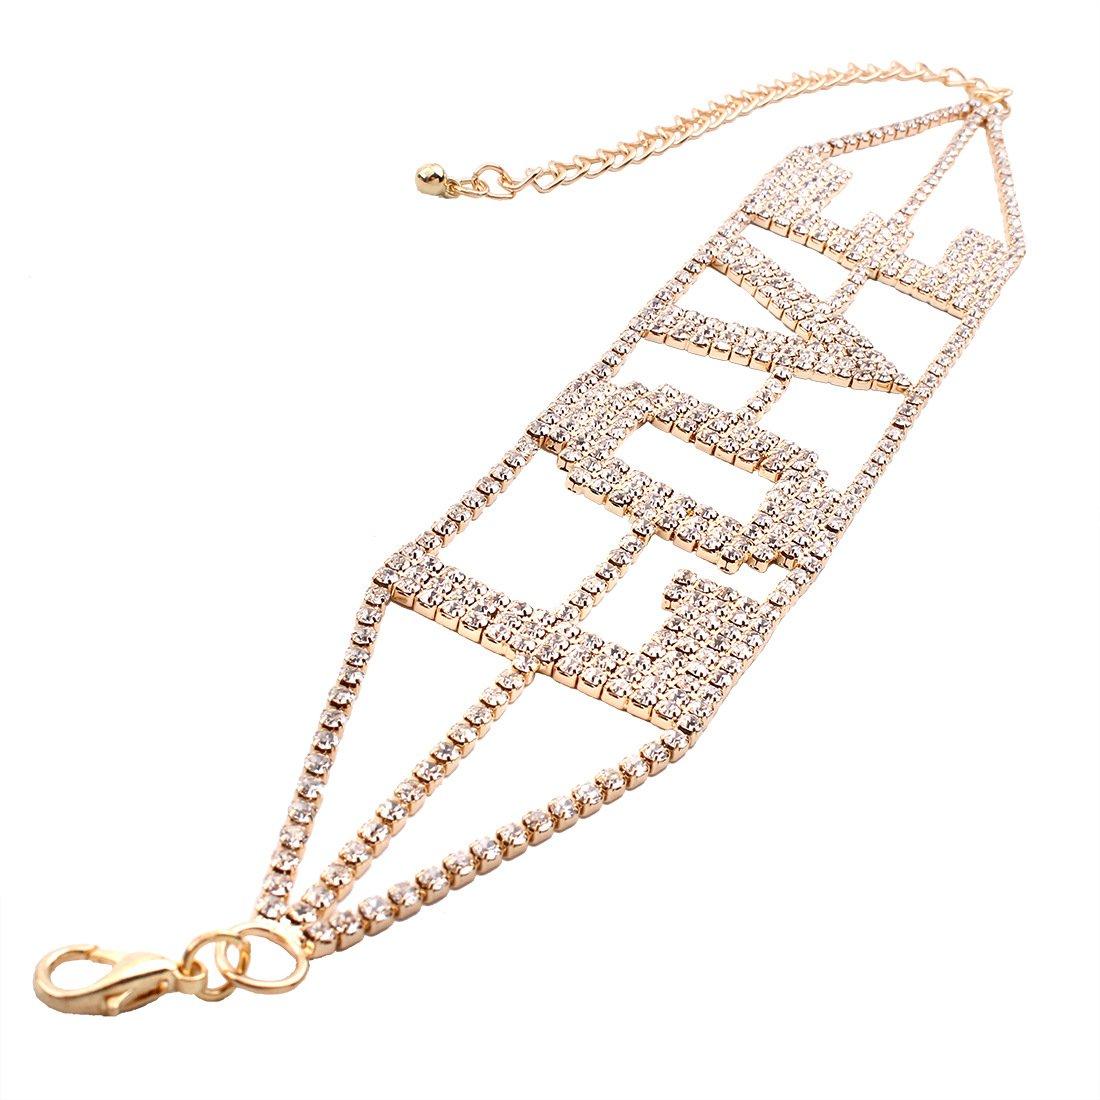 MengPa Rhinestone Choker Necklace for Women Fashion Letter Love Collar Wedding Jewelry Gold by MengPa (Image #5)